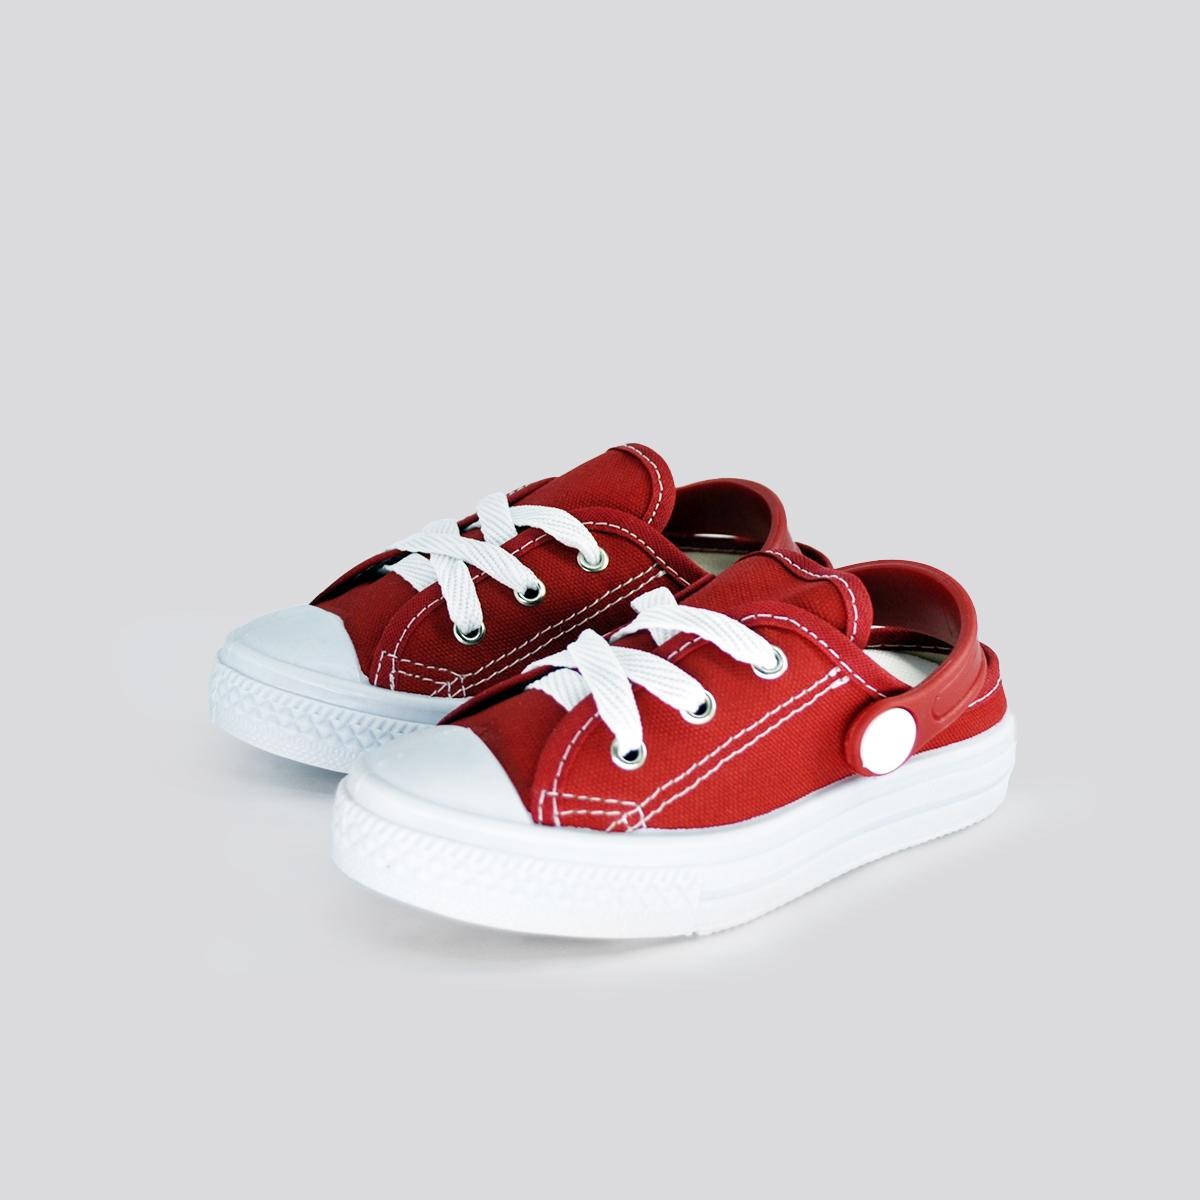 Tênis Infantil Foco Mule Vermelho